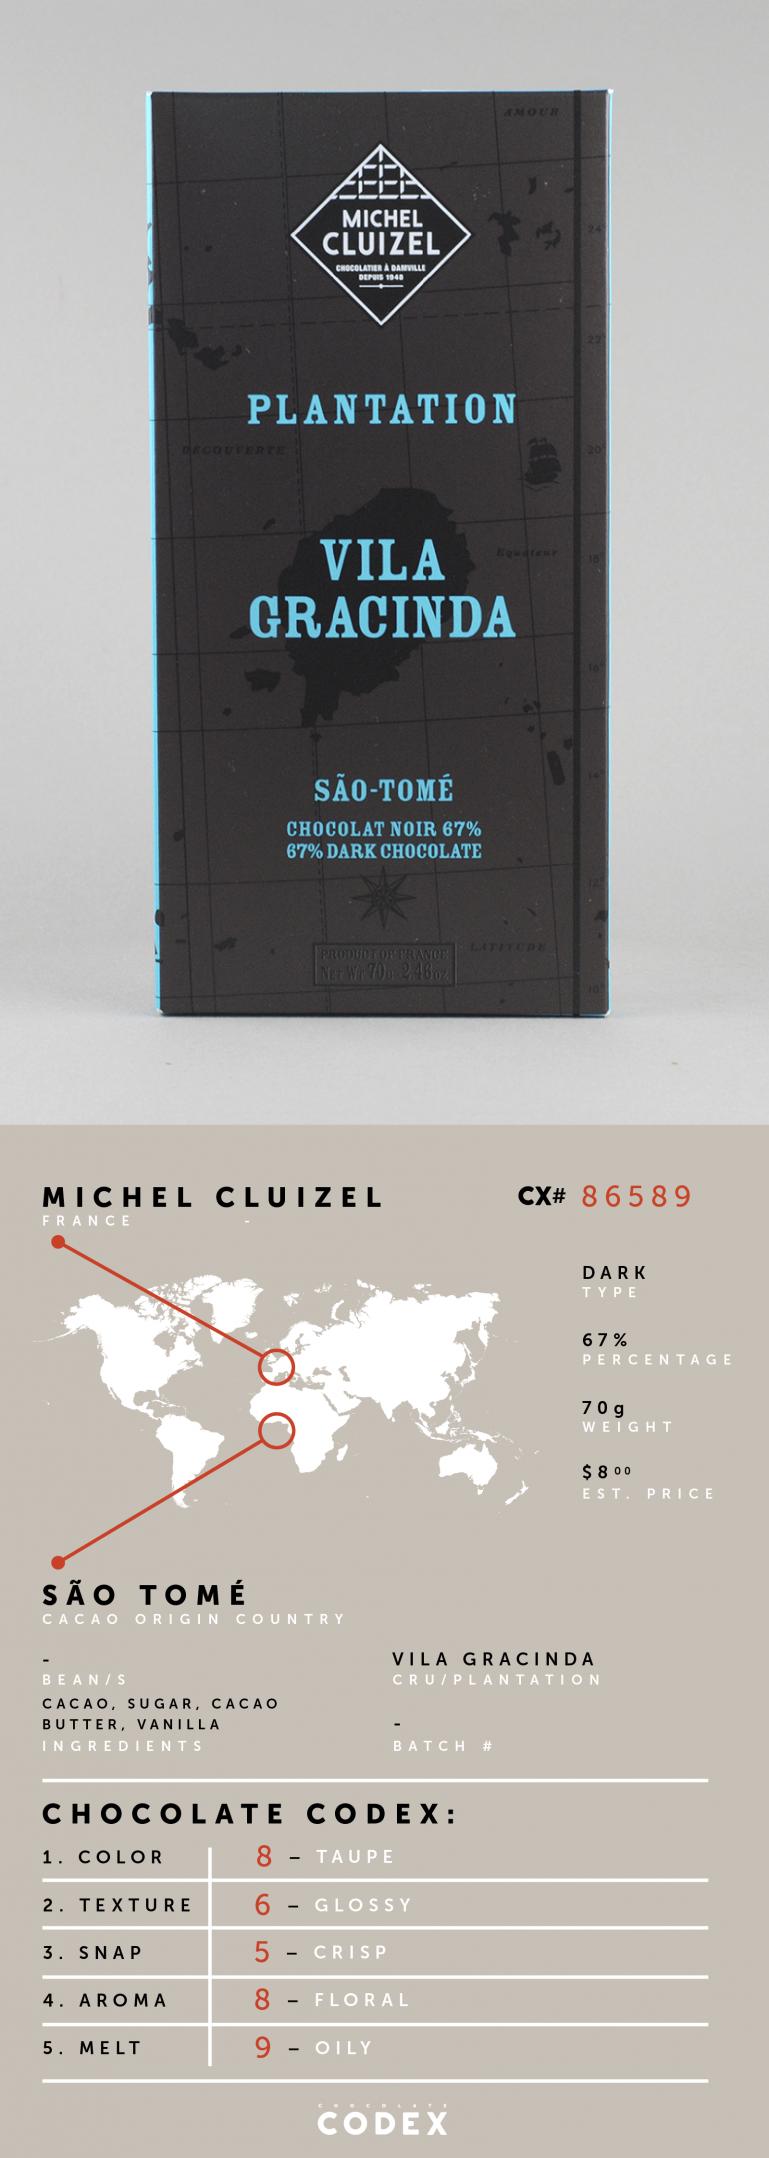 ChocolateCodex_Michel_Cluizel_Vila_Gracinda_67-06